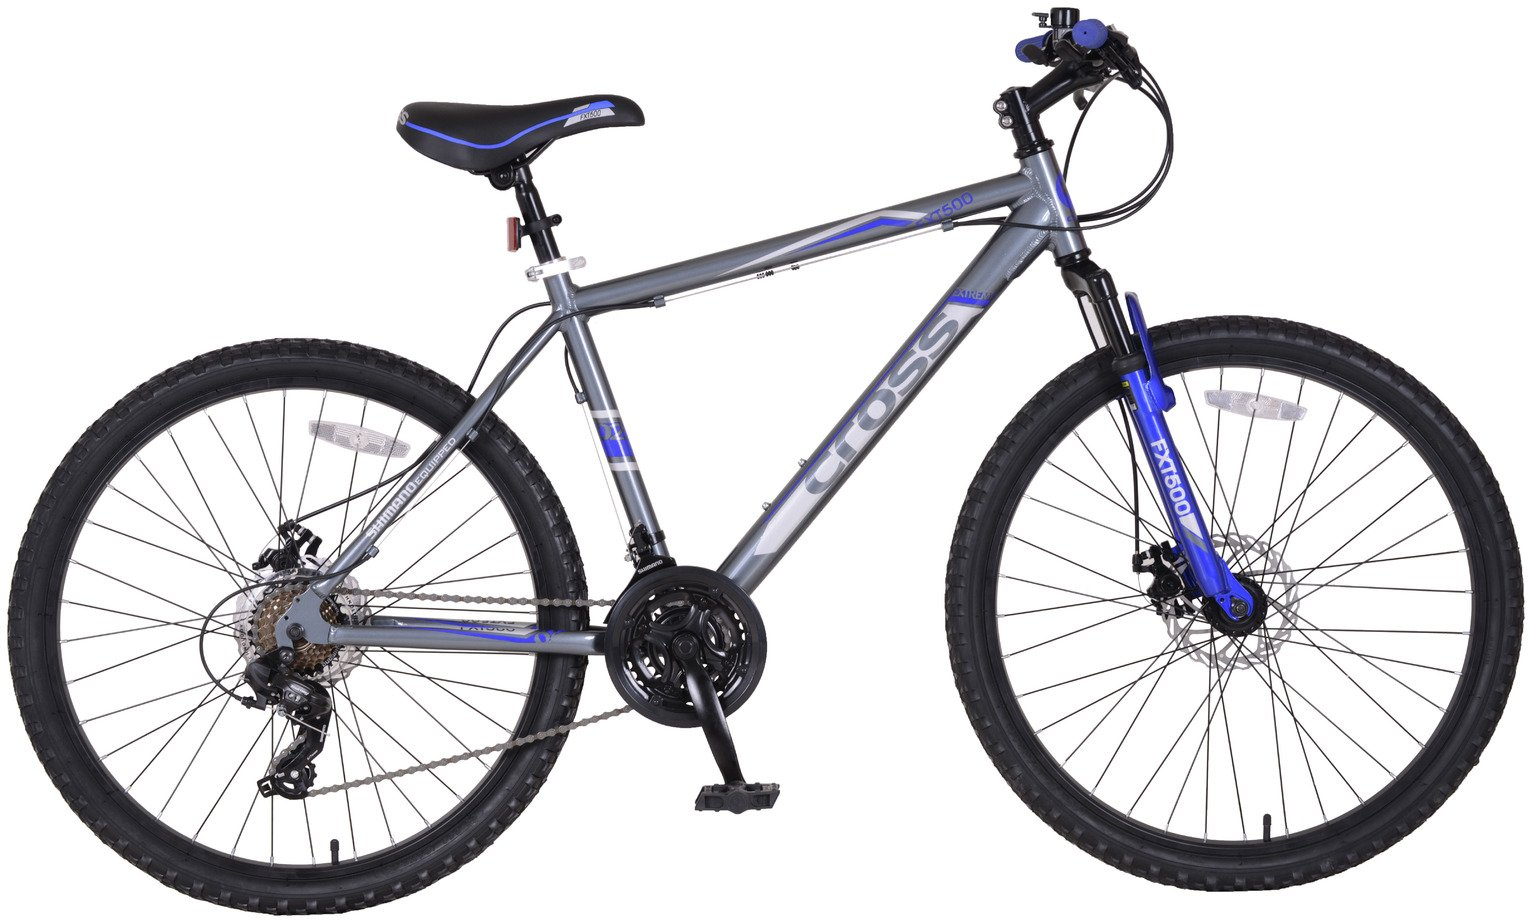 Buy Cross Fxt500 26 Inch Front Suspension Male Mountain Bike Men S